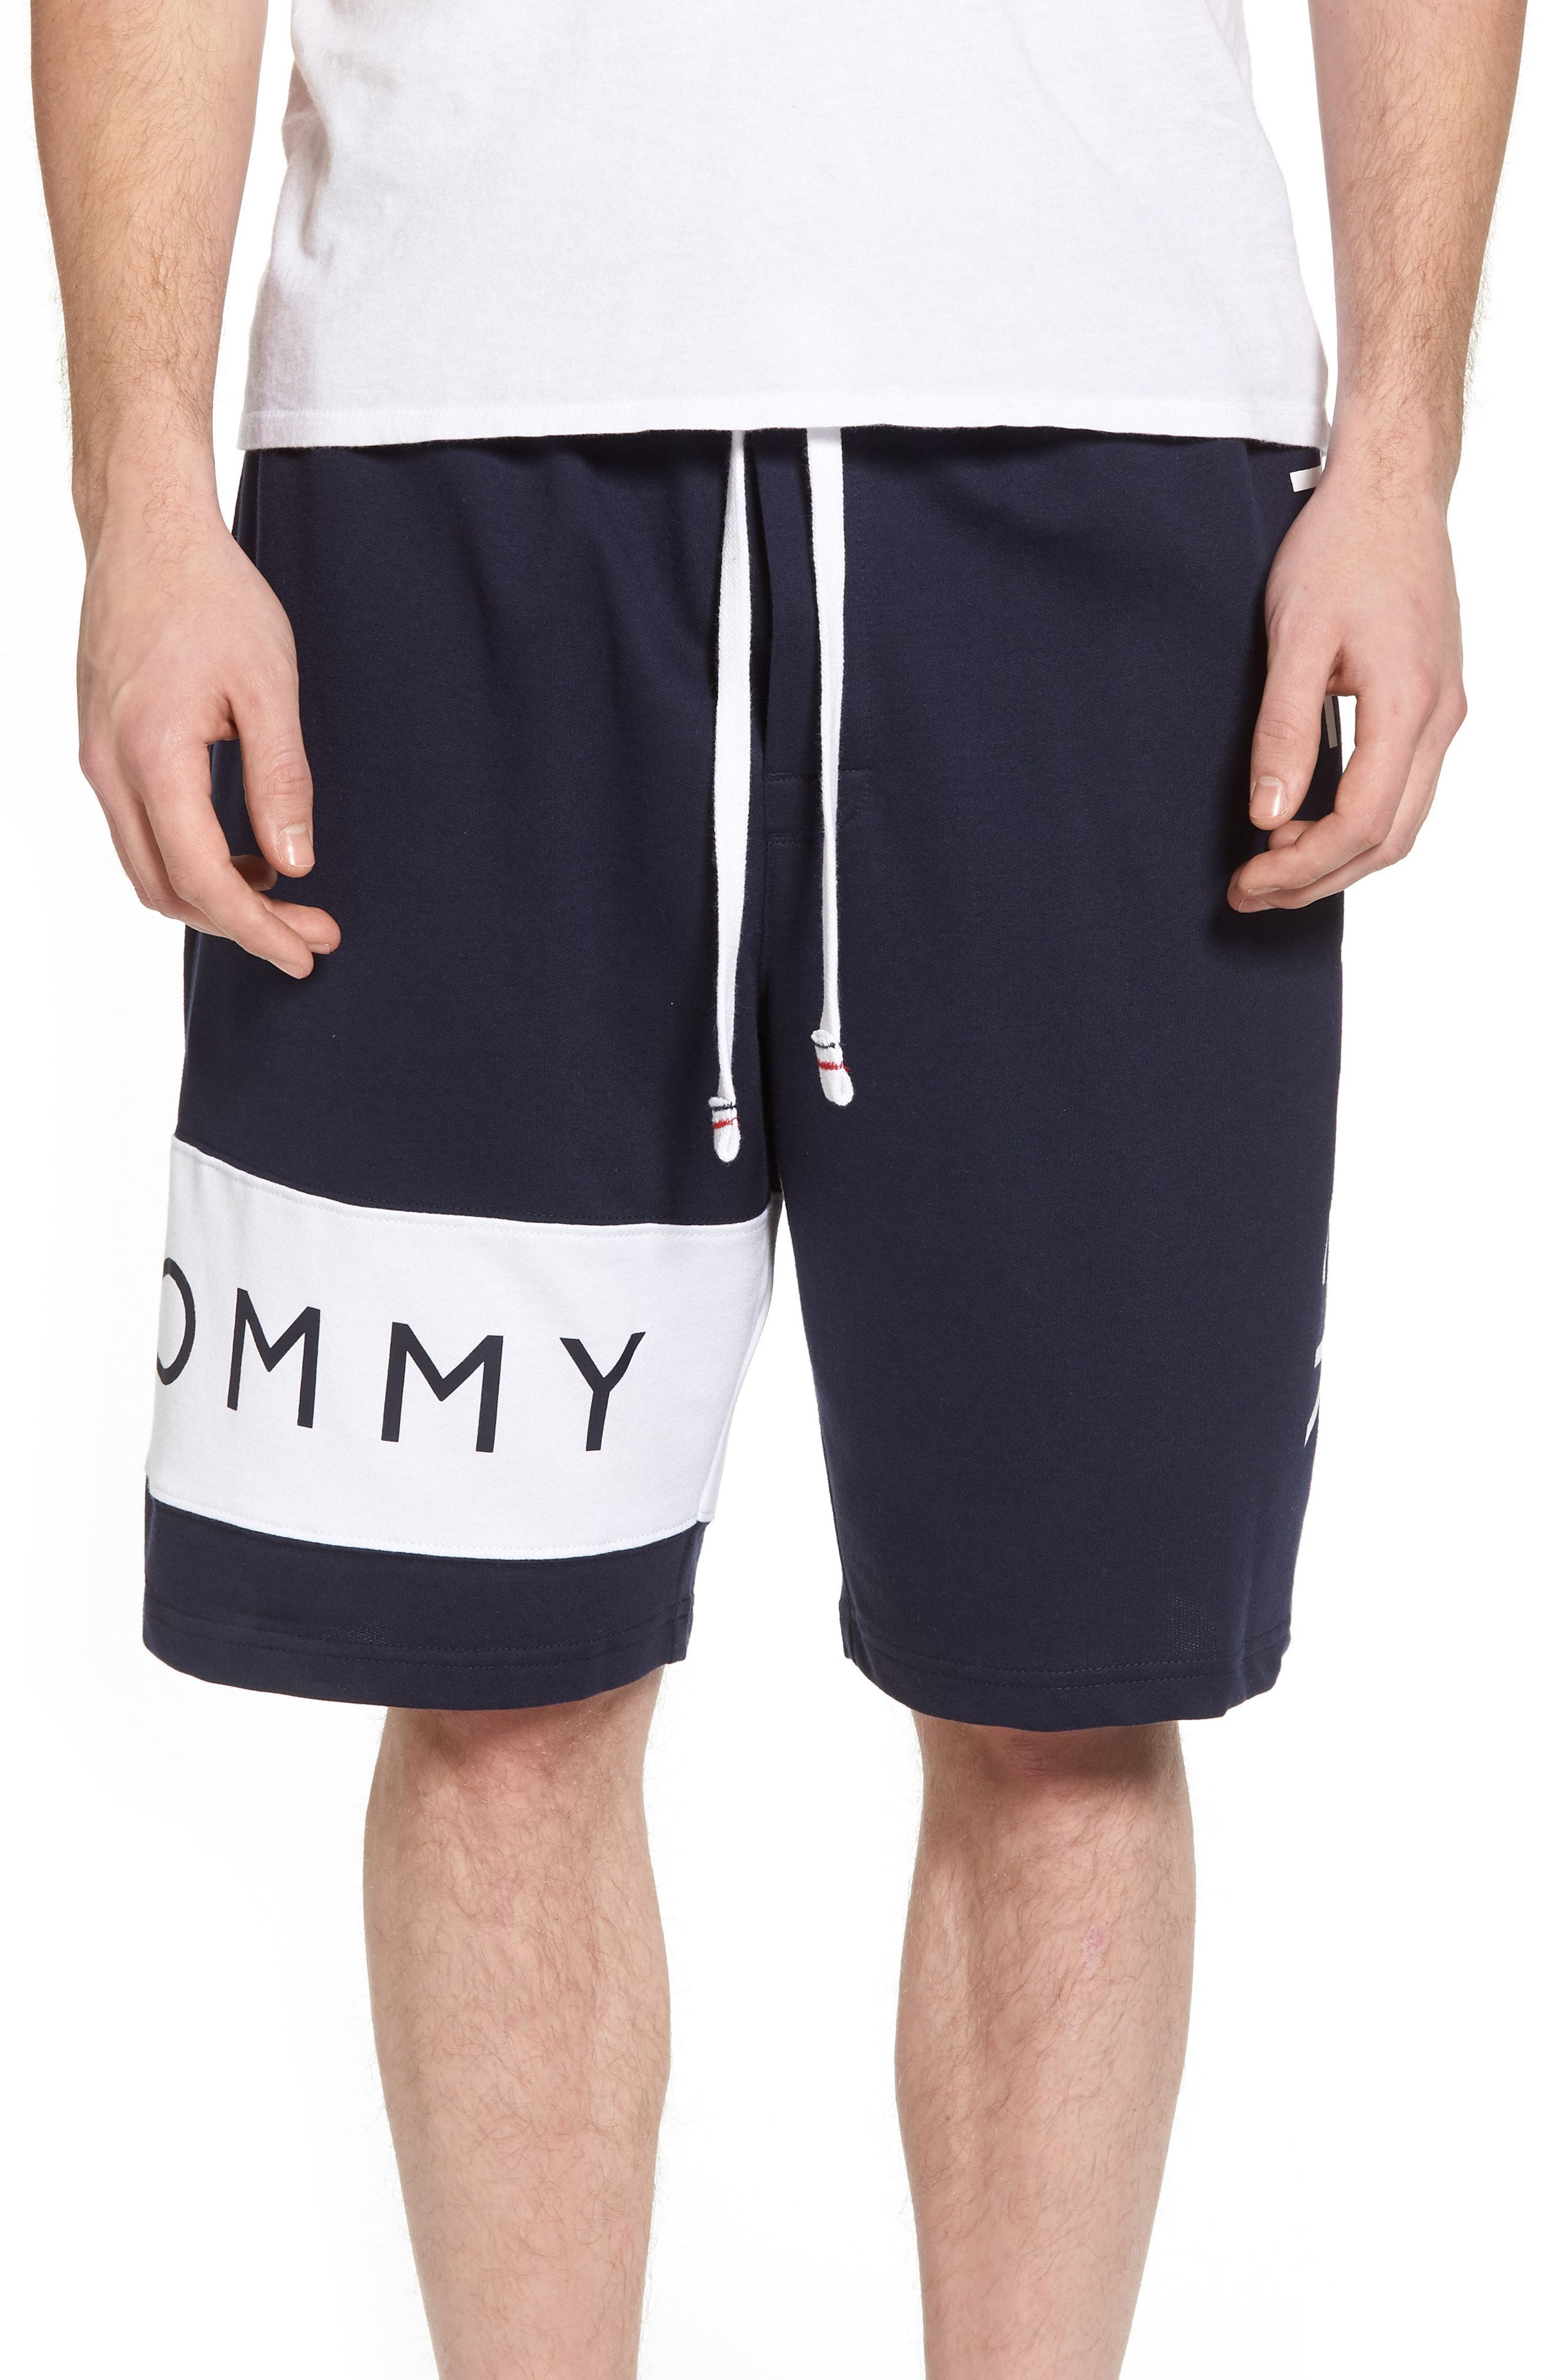 943dd0419e6c TOMMY HILFIGER LOUNGE SHORTS. #tommyhilfiger #cloth | Tommy Hilfiger ...